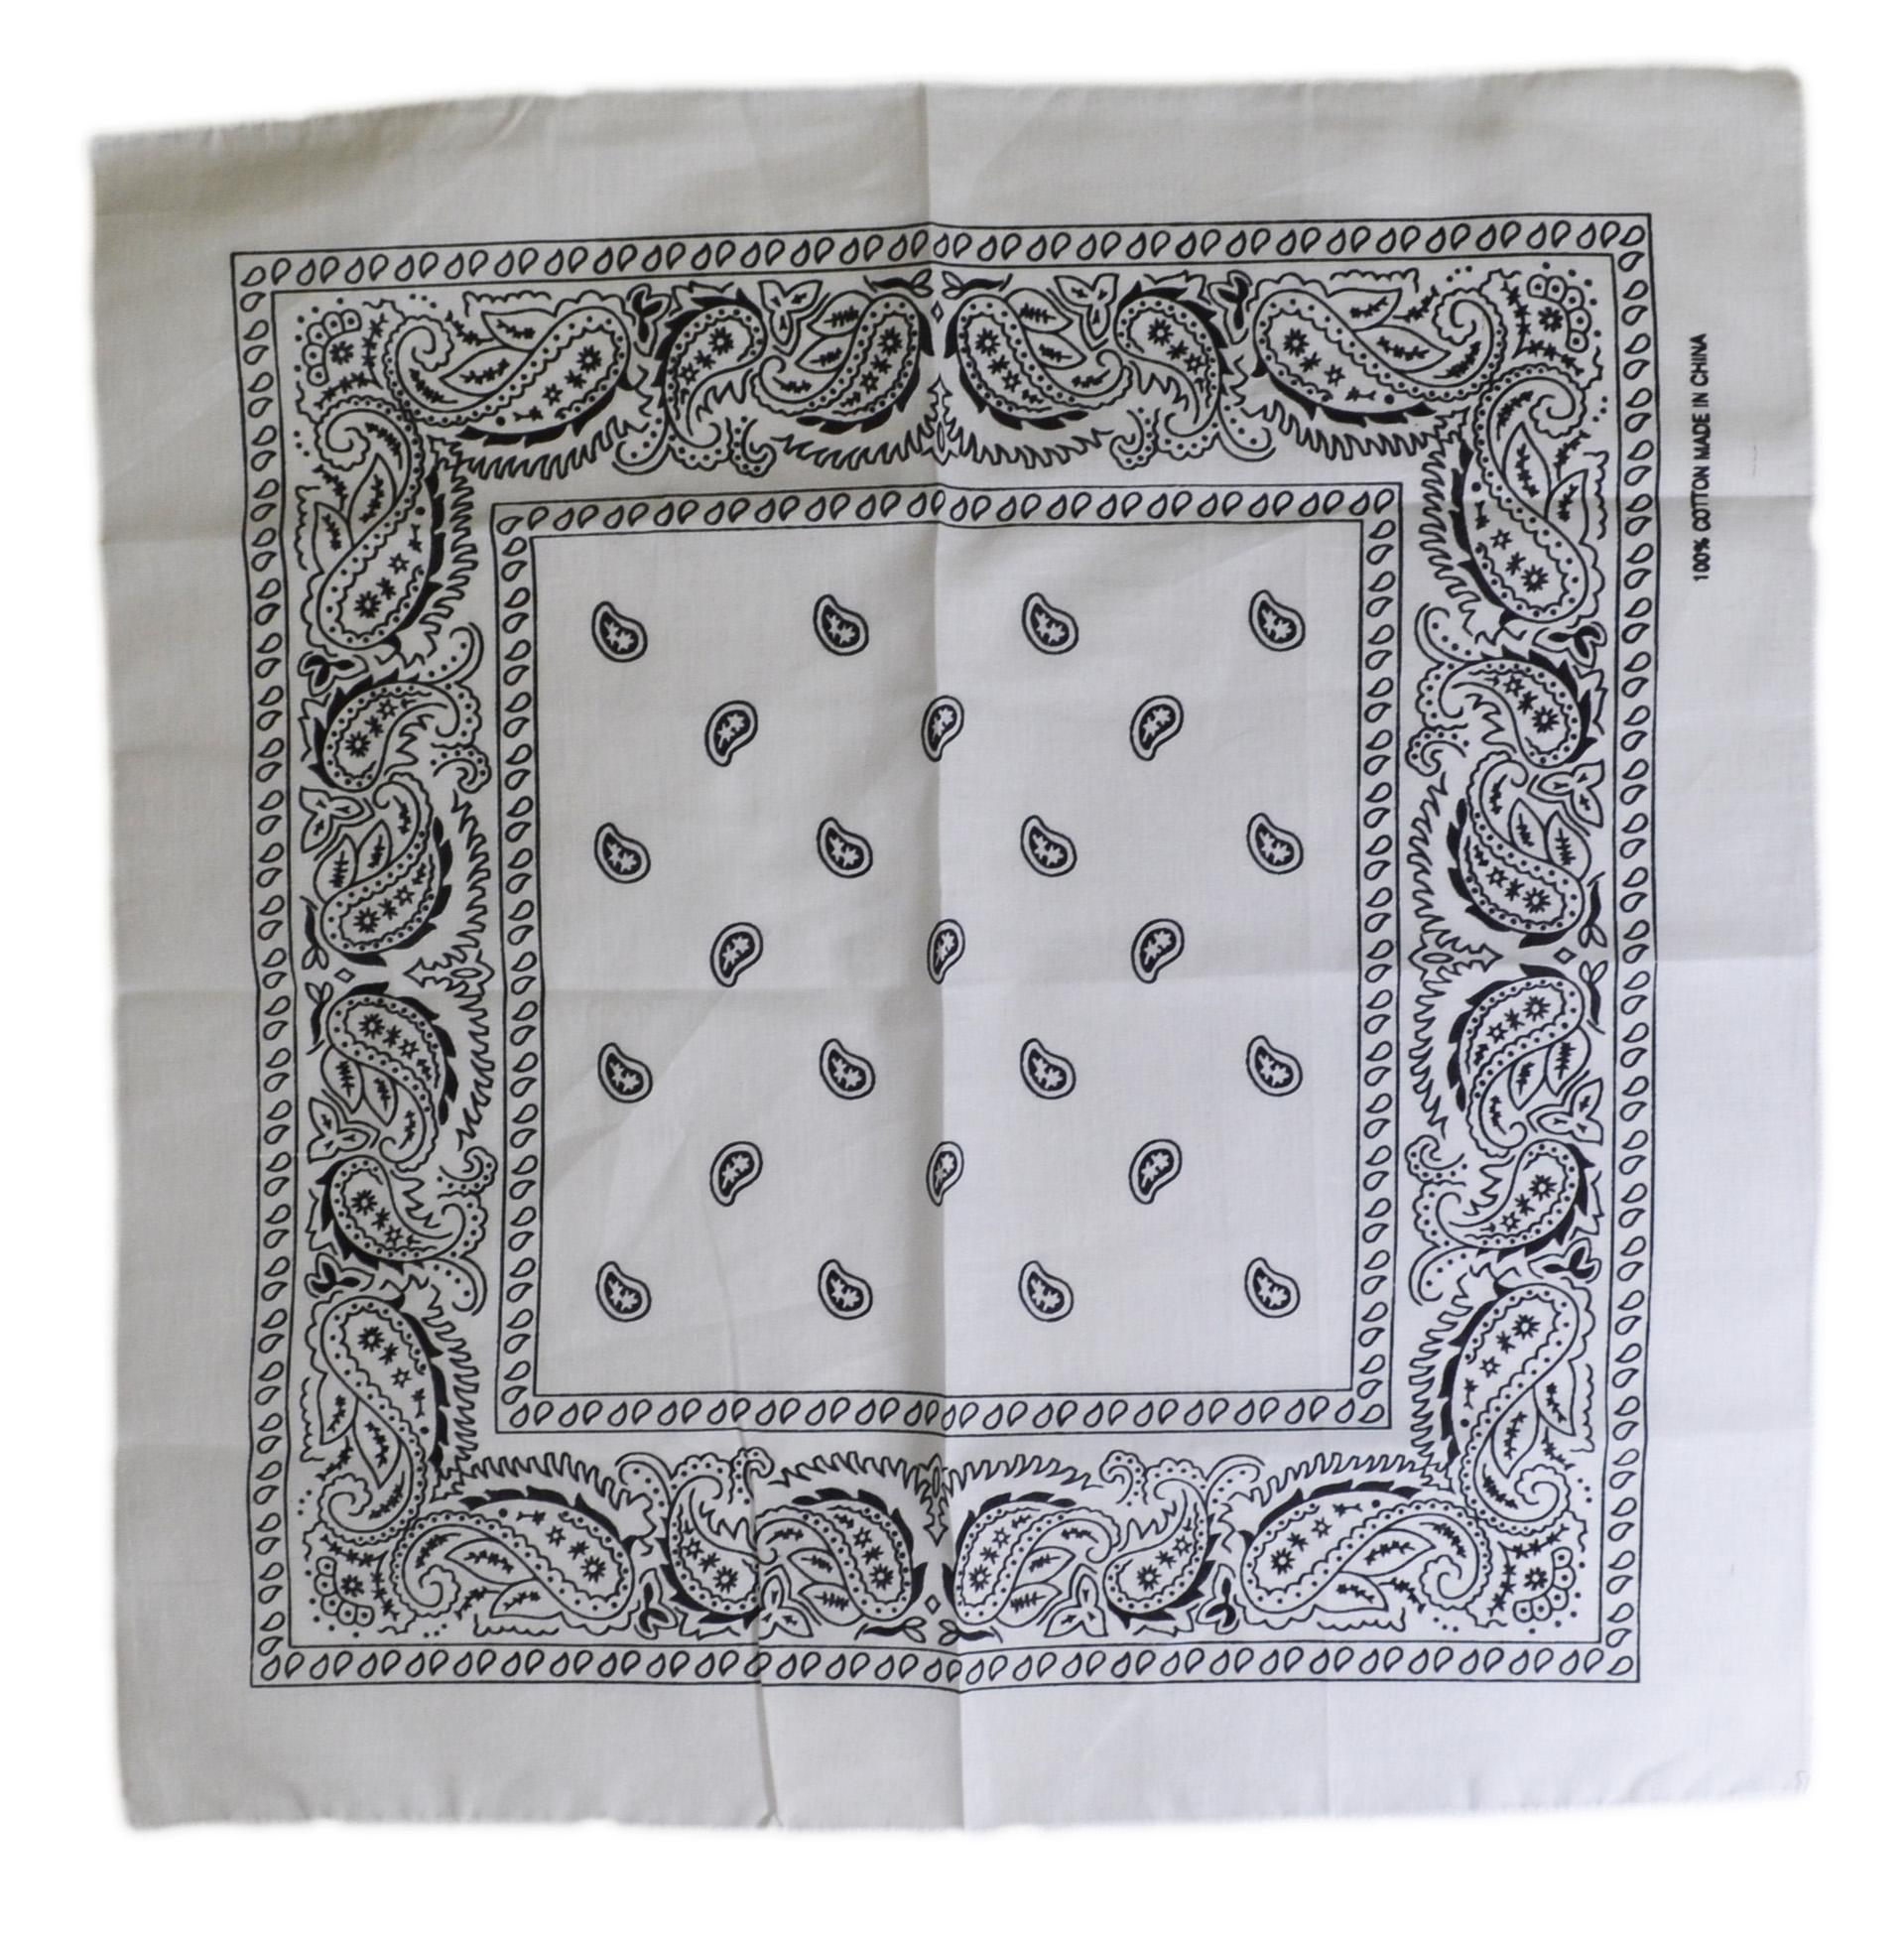 White Bandana Wallpaper More information